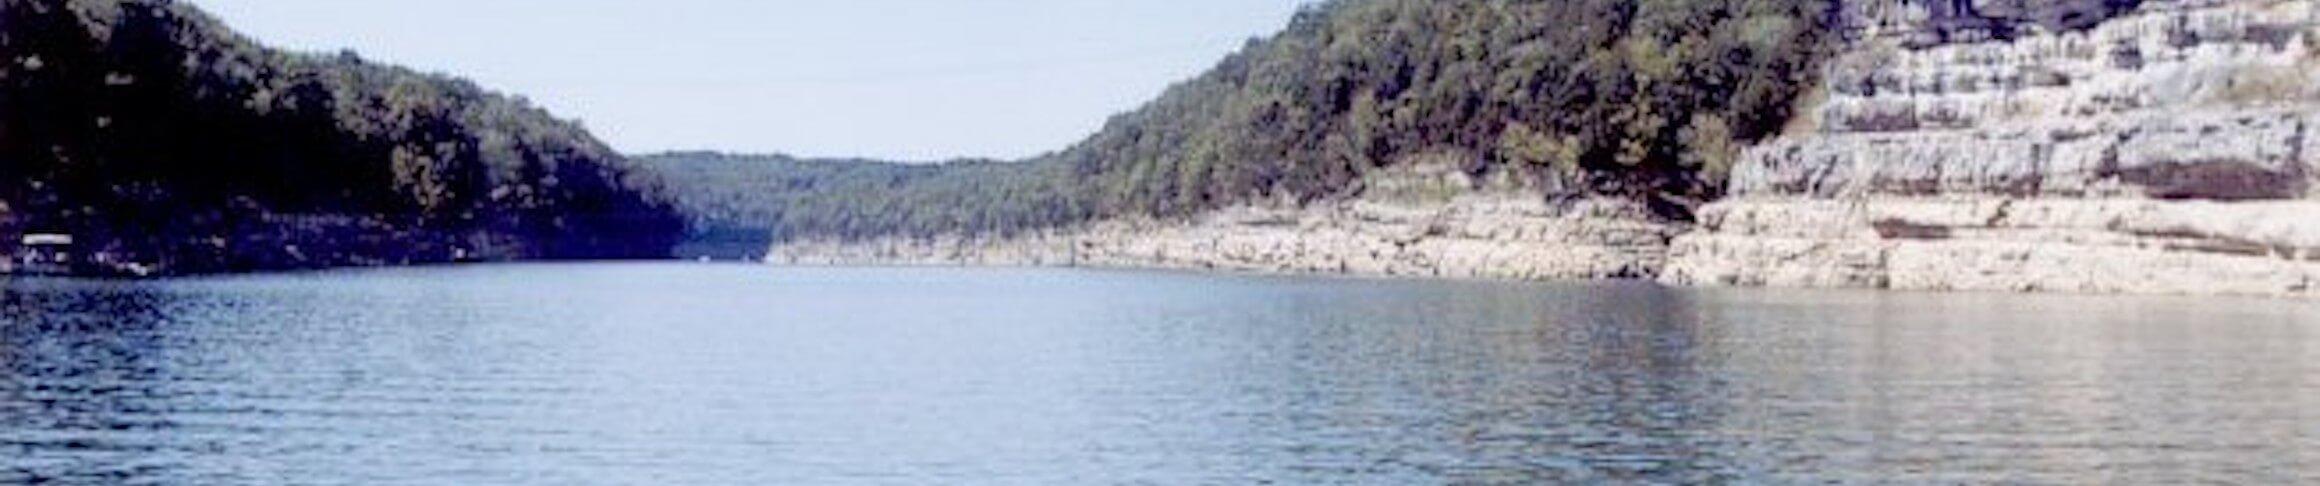 Lakecumb